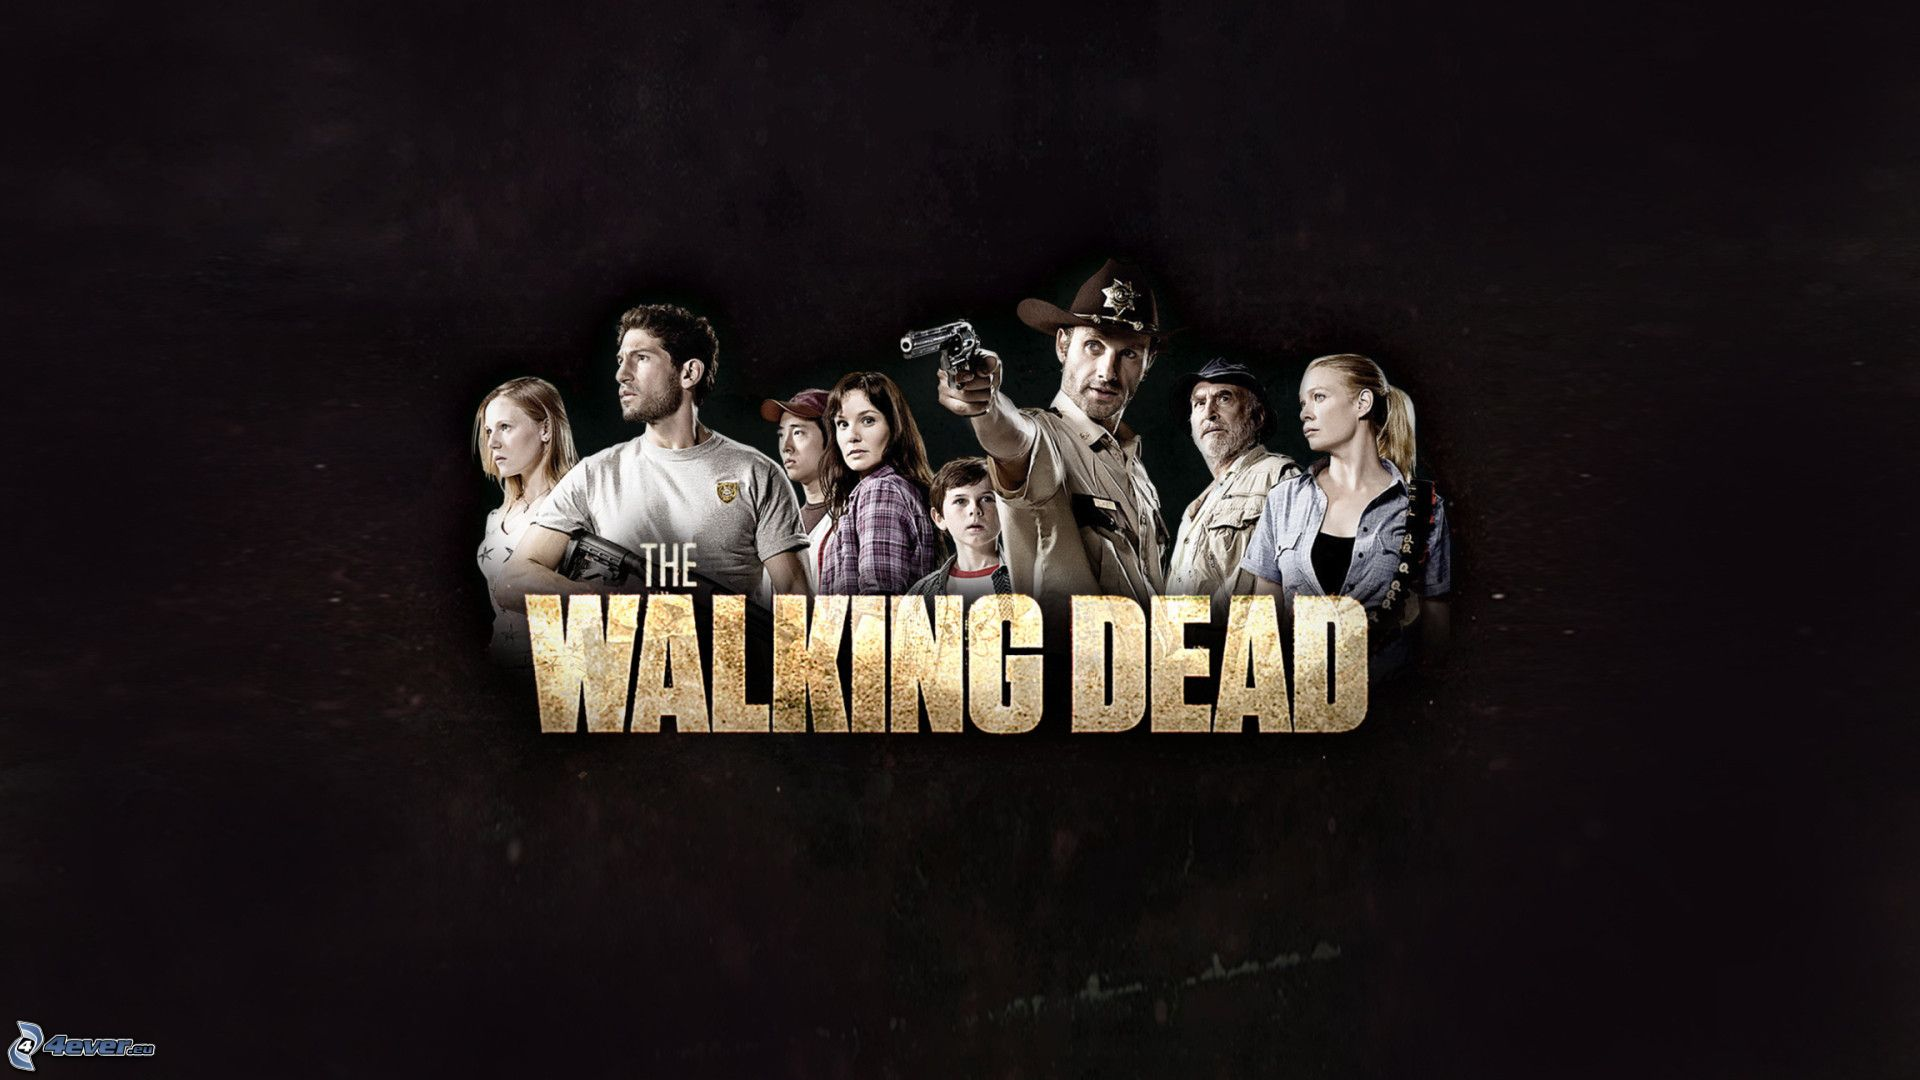 The Walking Dead Logo 2014 Fondo De Pantalla Fondos De: The Walking Dead